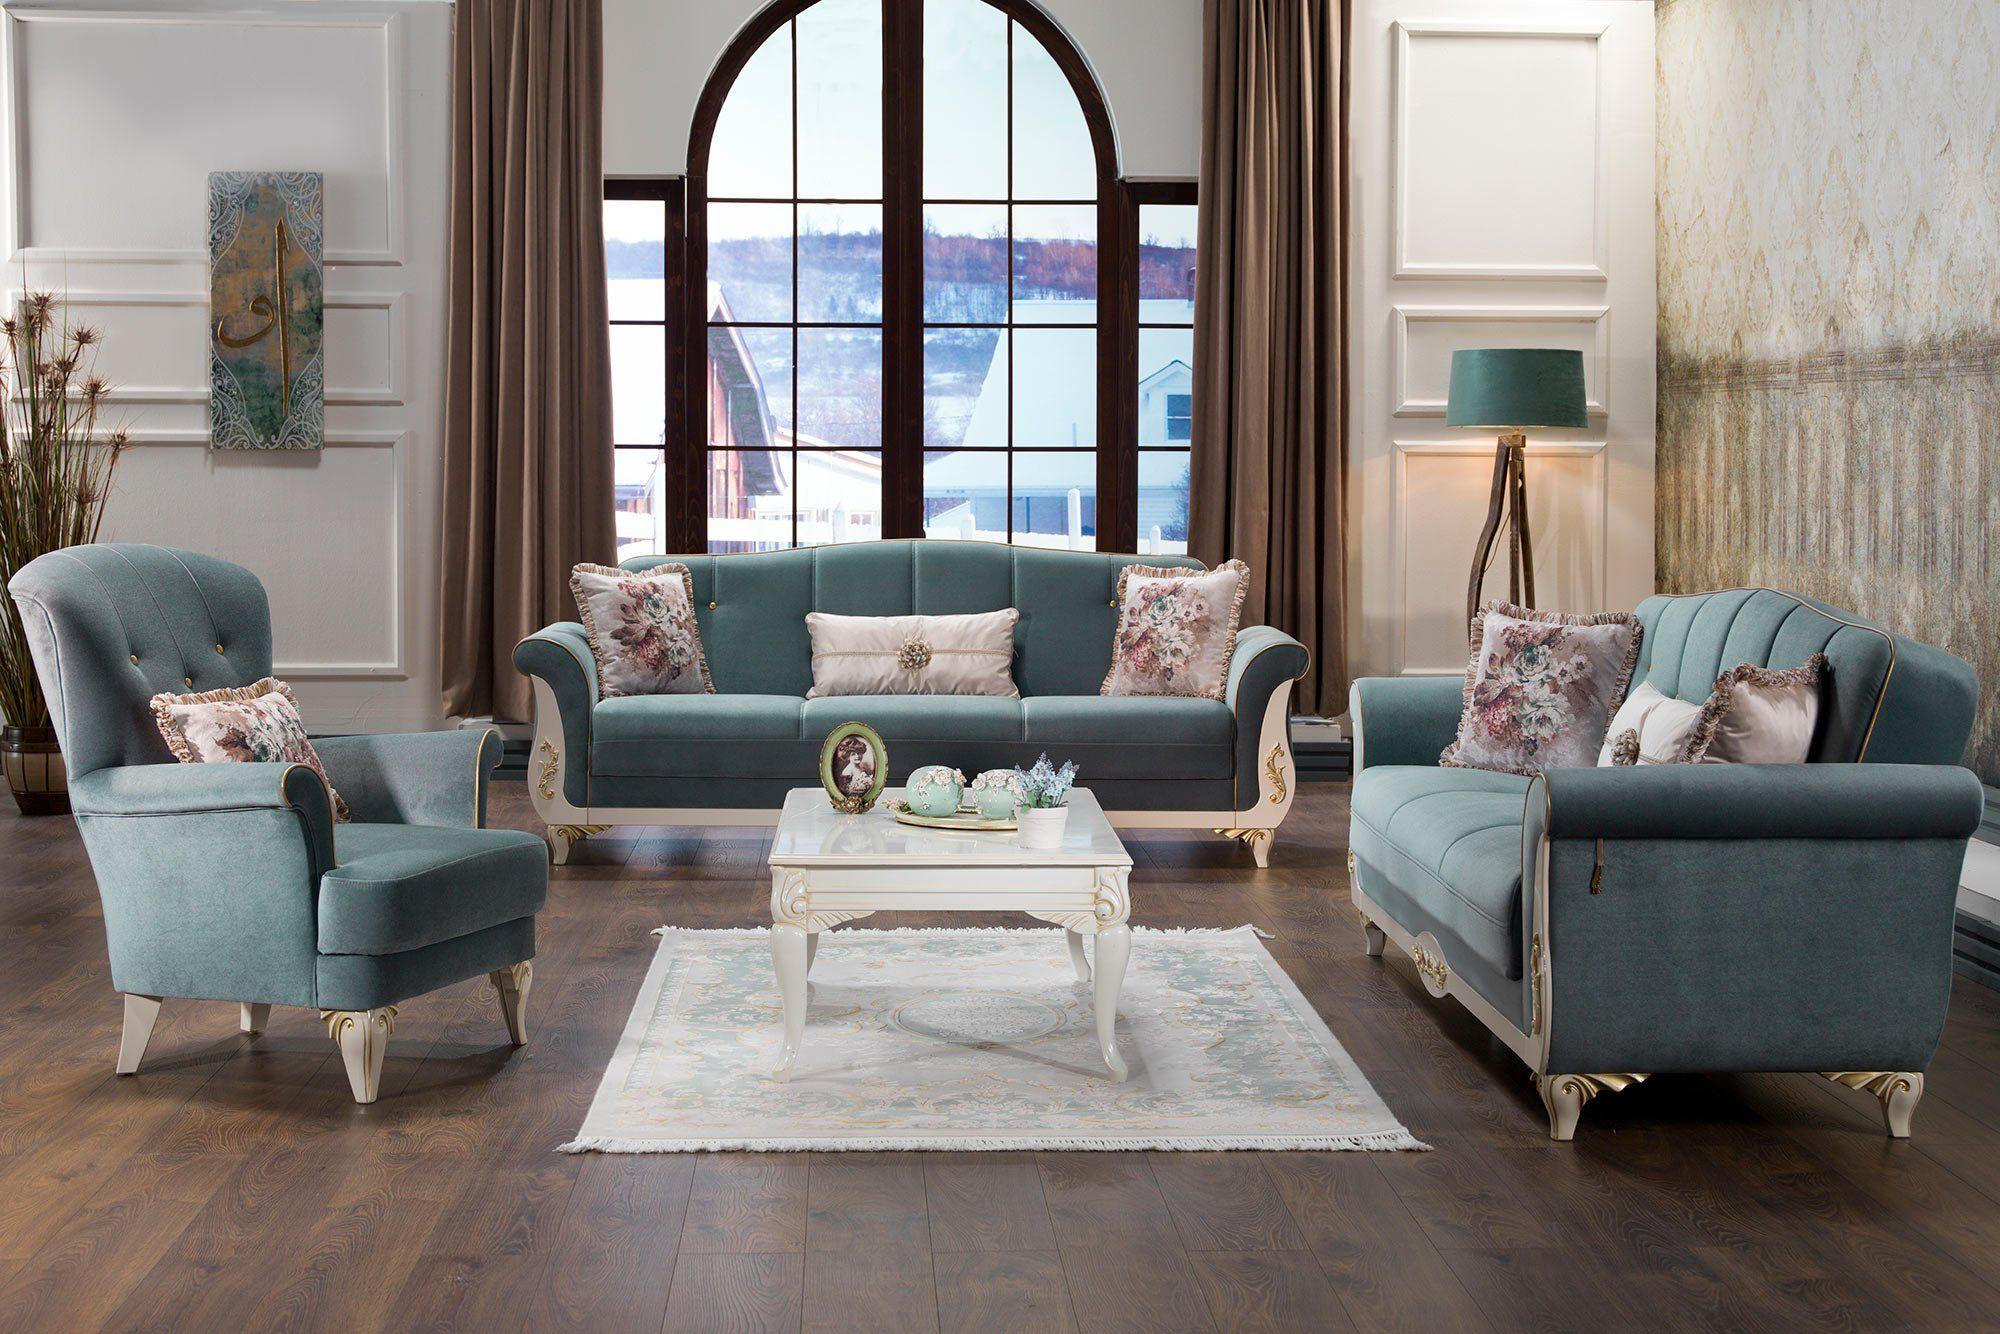 Astoria Caprice Seafoam Green Sofa, Love & Chair Set by ...